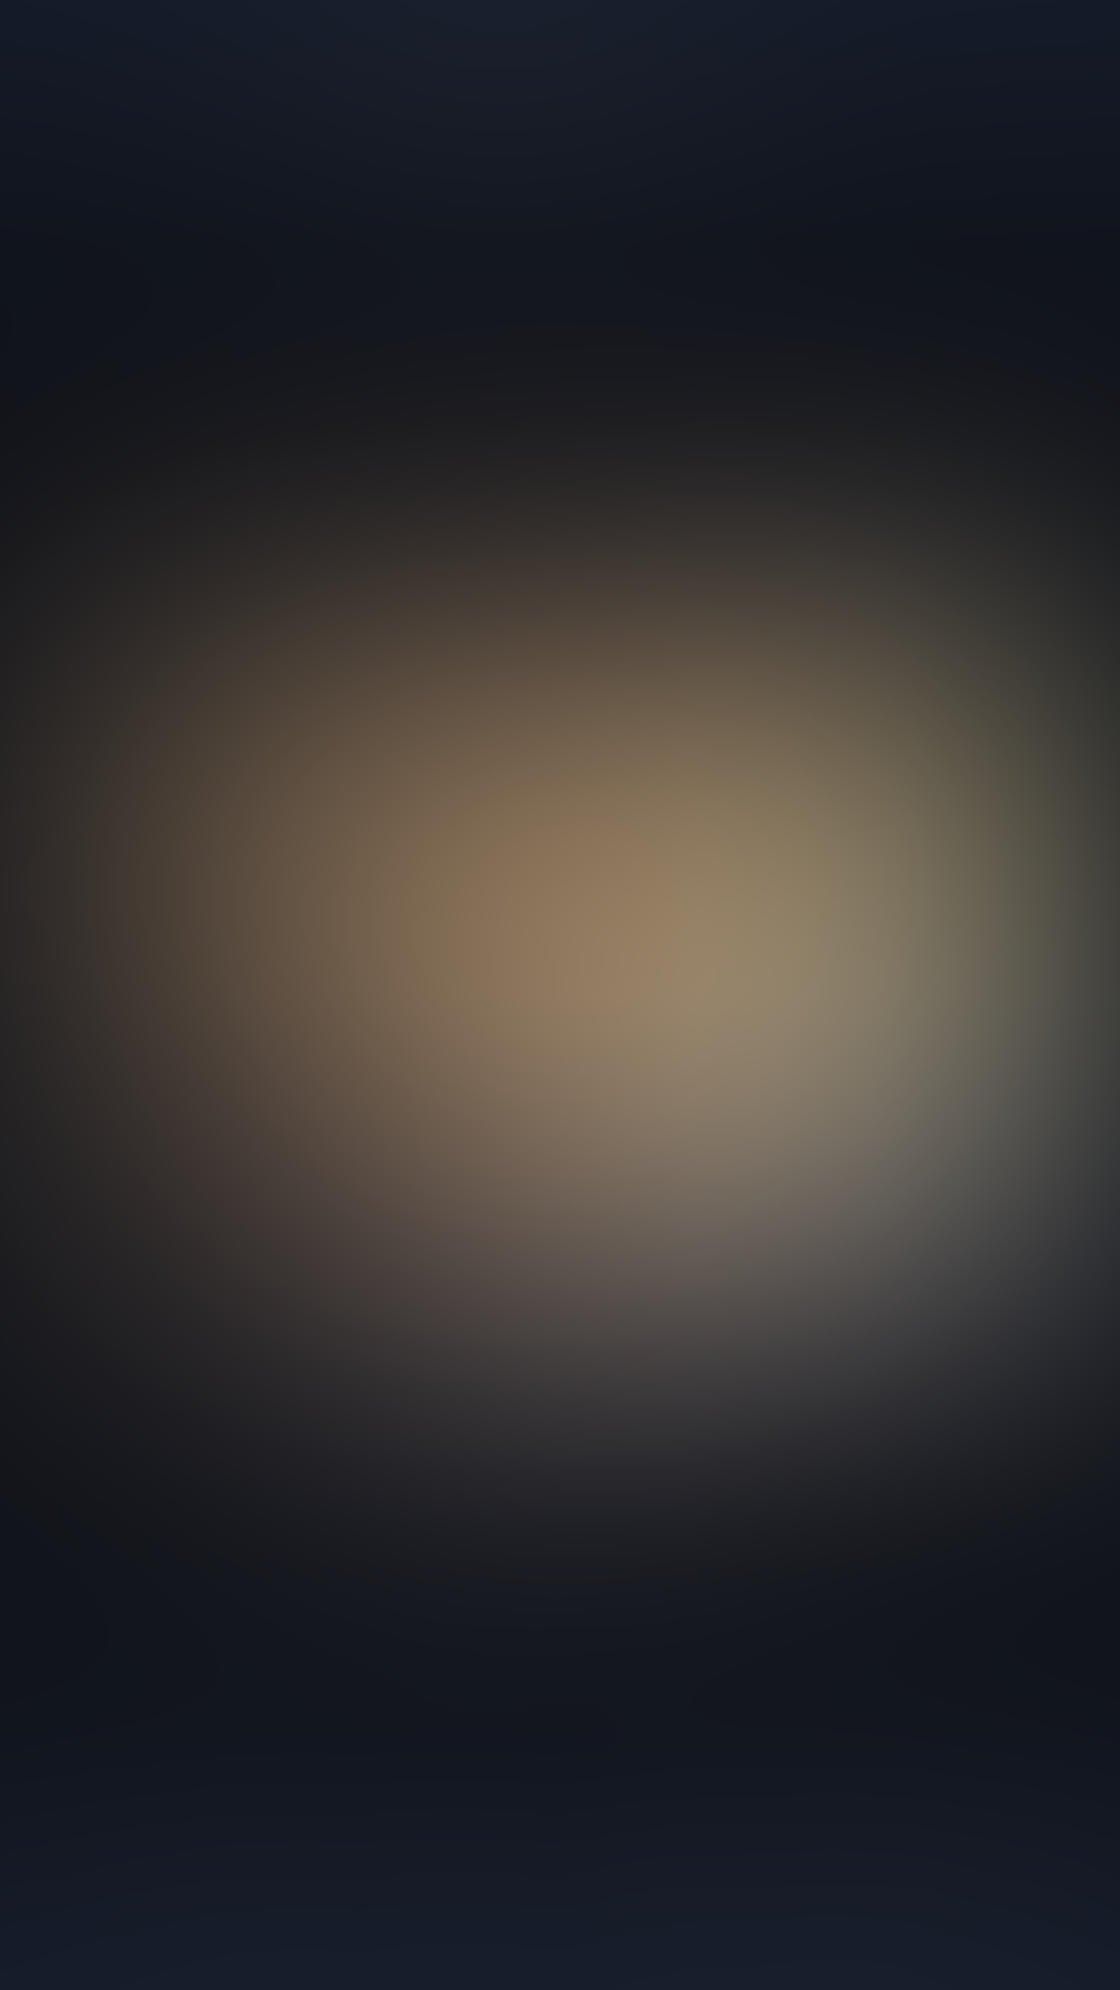 Lenslight iPhone Photo App 25